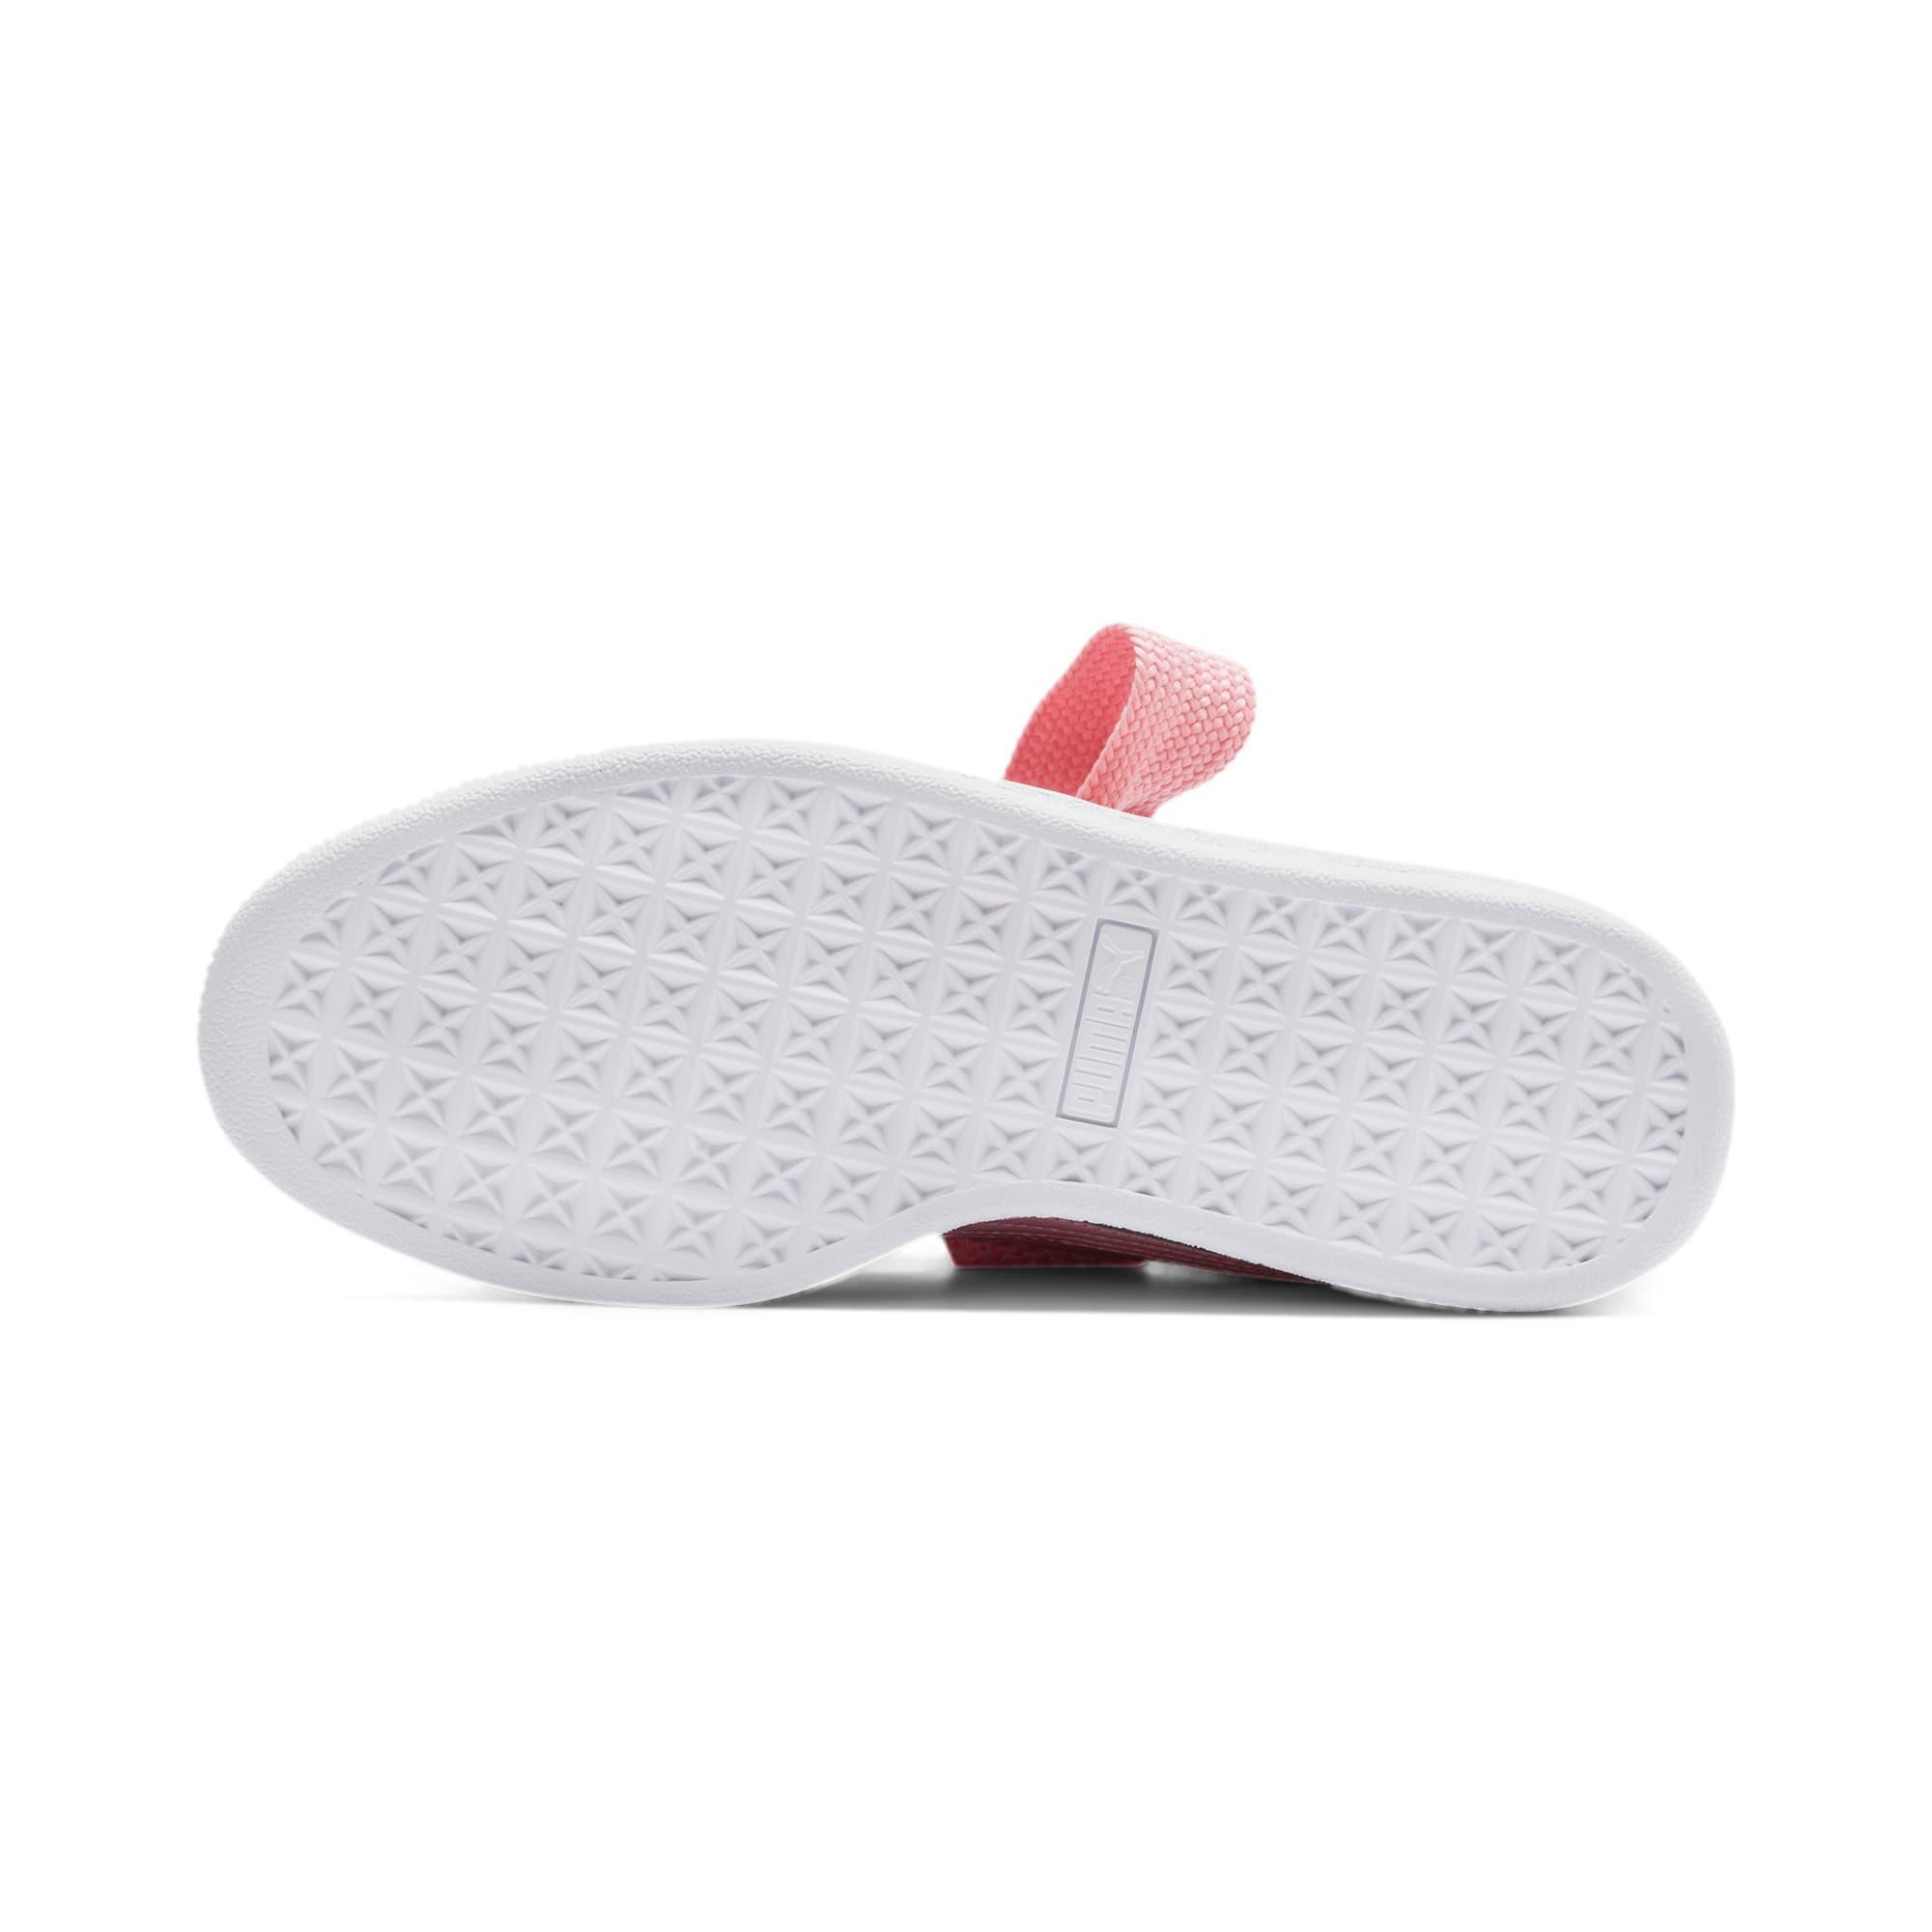 Thumbnail 5 of Basket Heart Patent Women's Sneakers, Bridal Rose-Puma Team Gold, medium